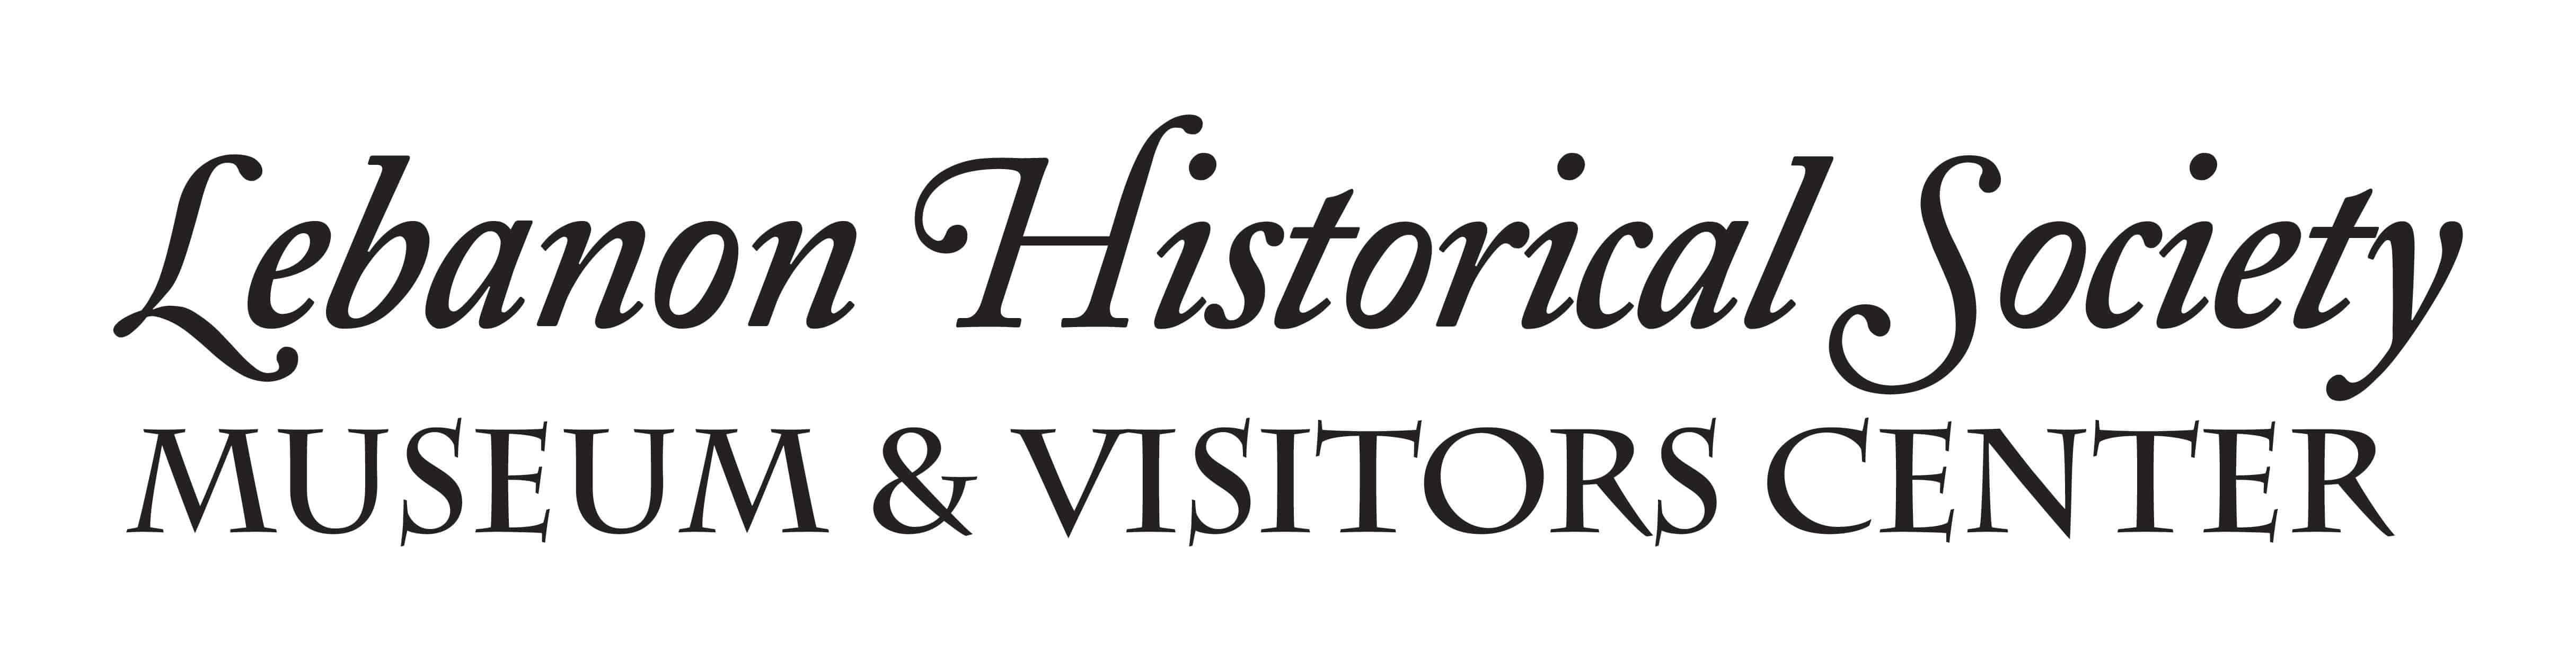 lebanon historical logo